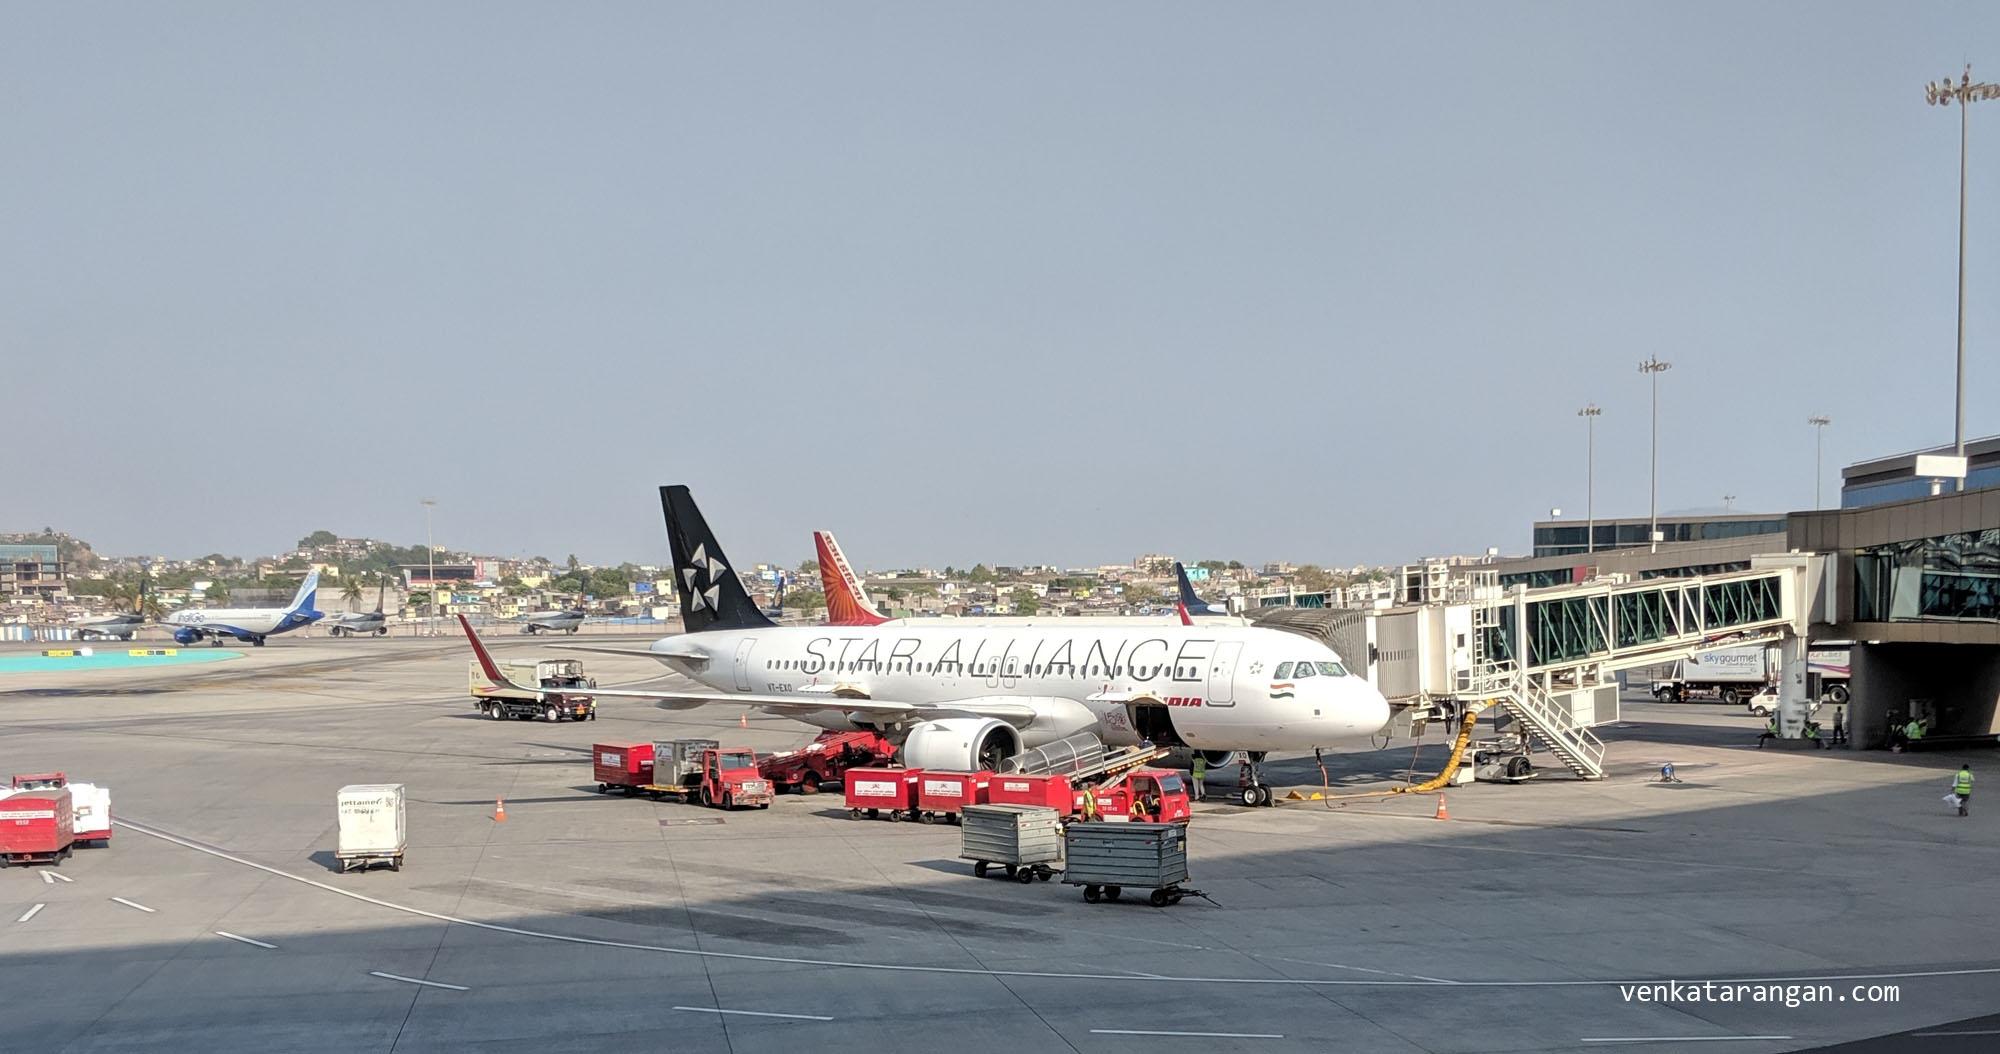 Air India plane sporting Star Alliance logo